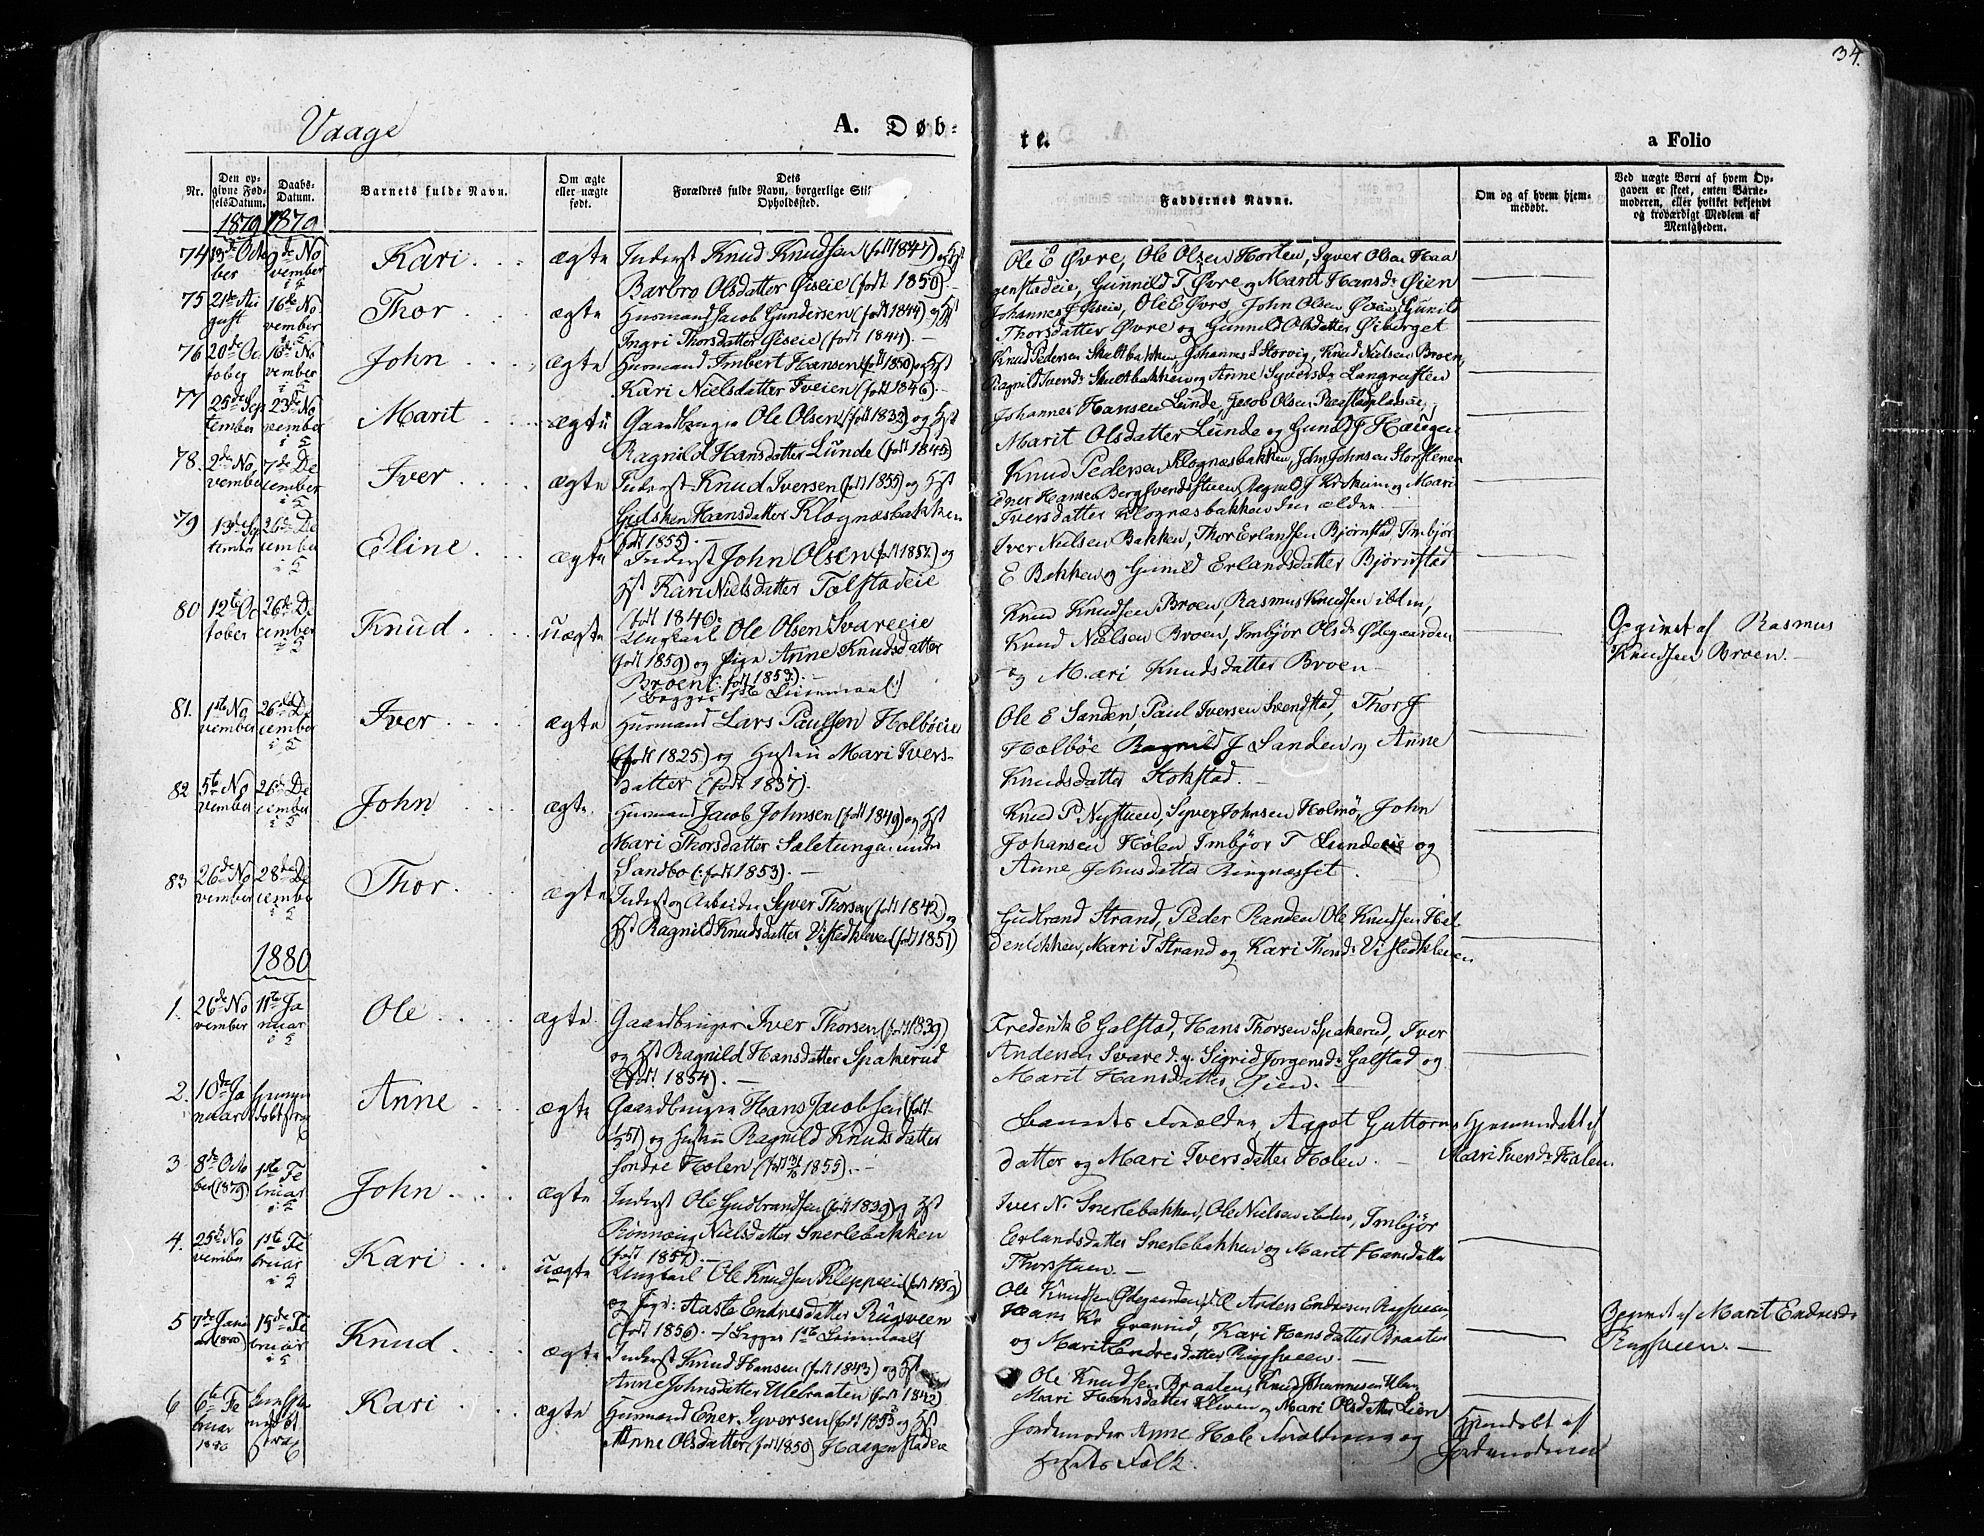 SAH, Vågå prestekontor, Ministerialbok nr. 7 /1, 1872-1886, s. 34